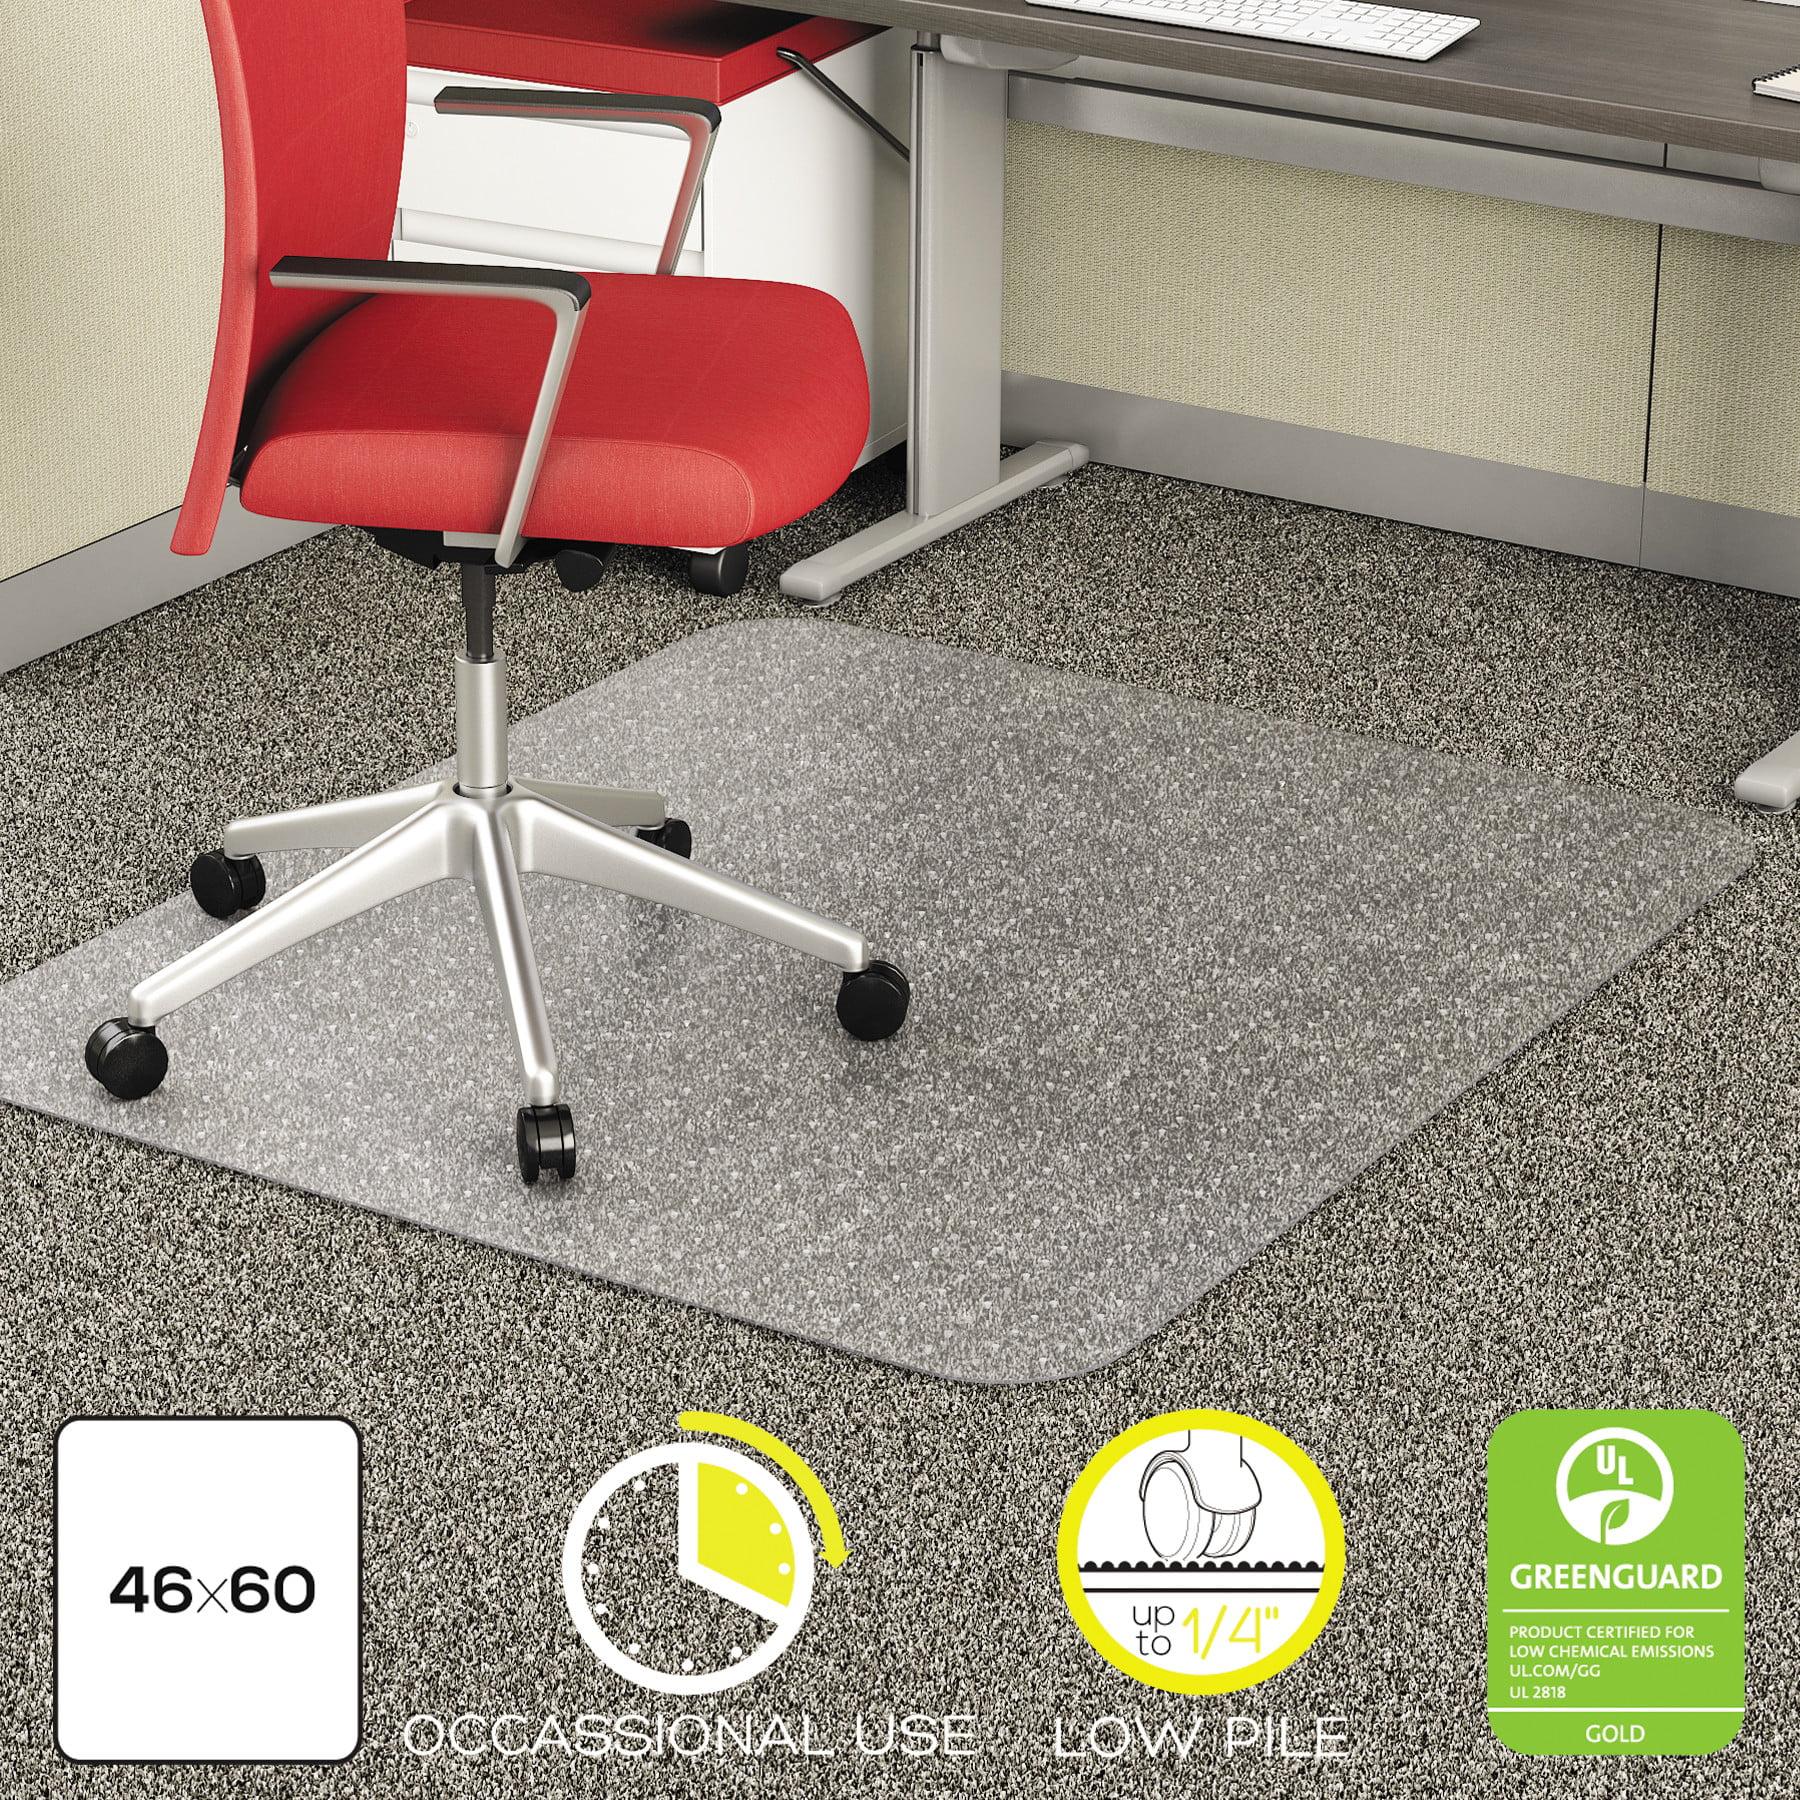 Deflecto EconoMat 46 x 60 Chair Mat for Low Pile Carpet, Rectangular